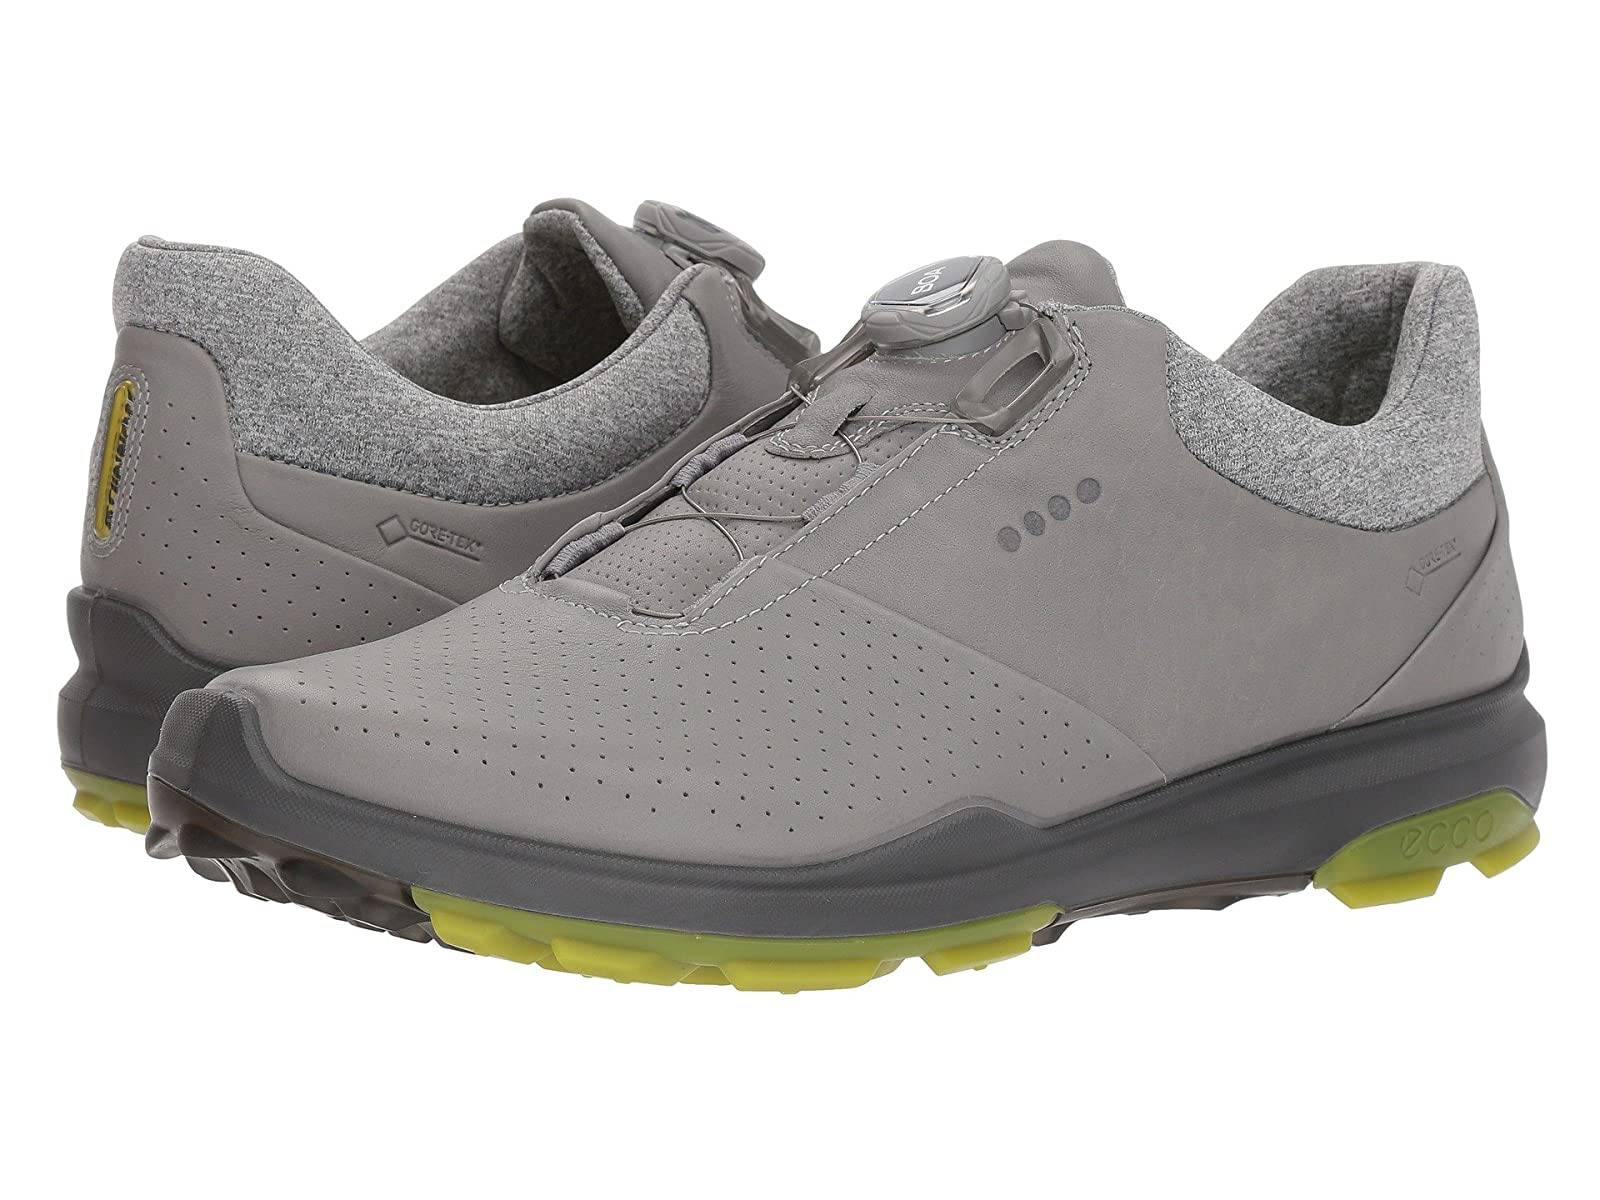 ECCO Golf Biom Hybrid 3 BoaAtmospheric grades have affordable shoes